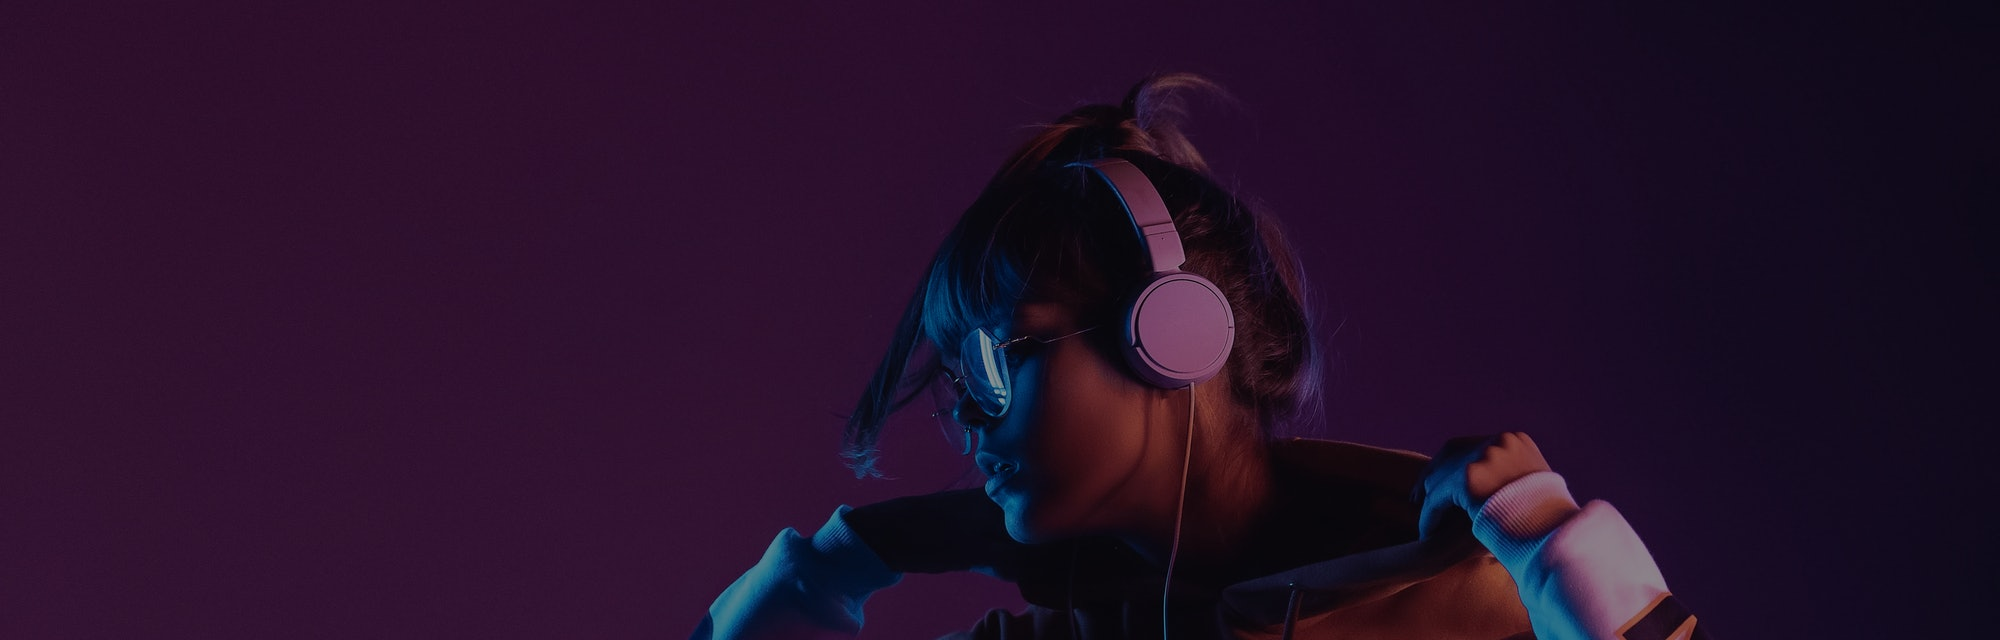 Hipster igen teen pretty fashion girl model wear stylish glasses headphones enjoy listen new cool mu...